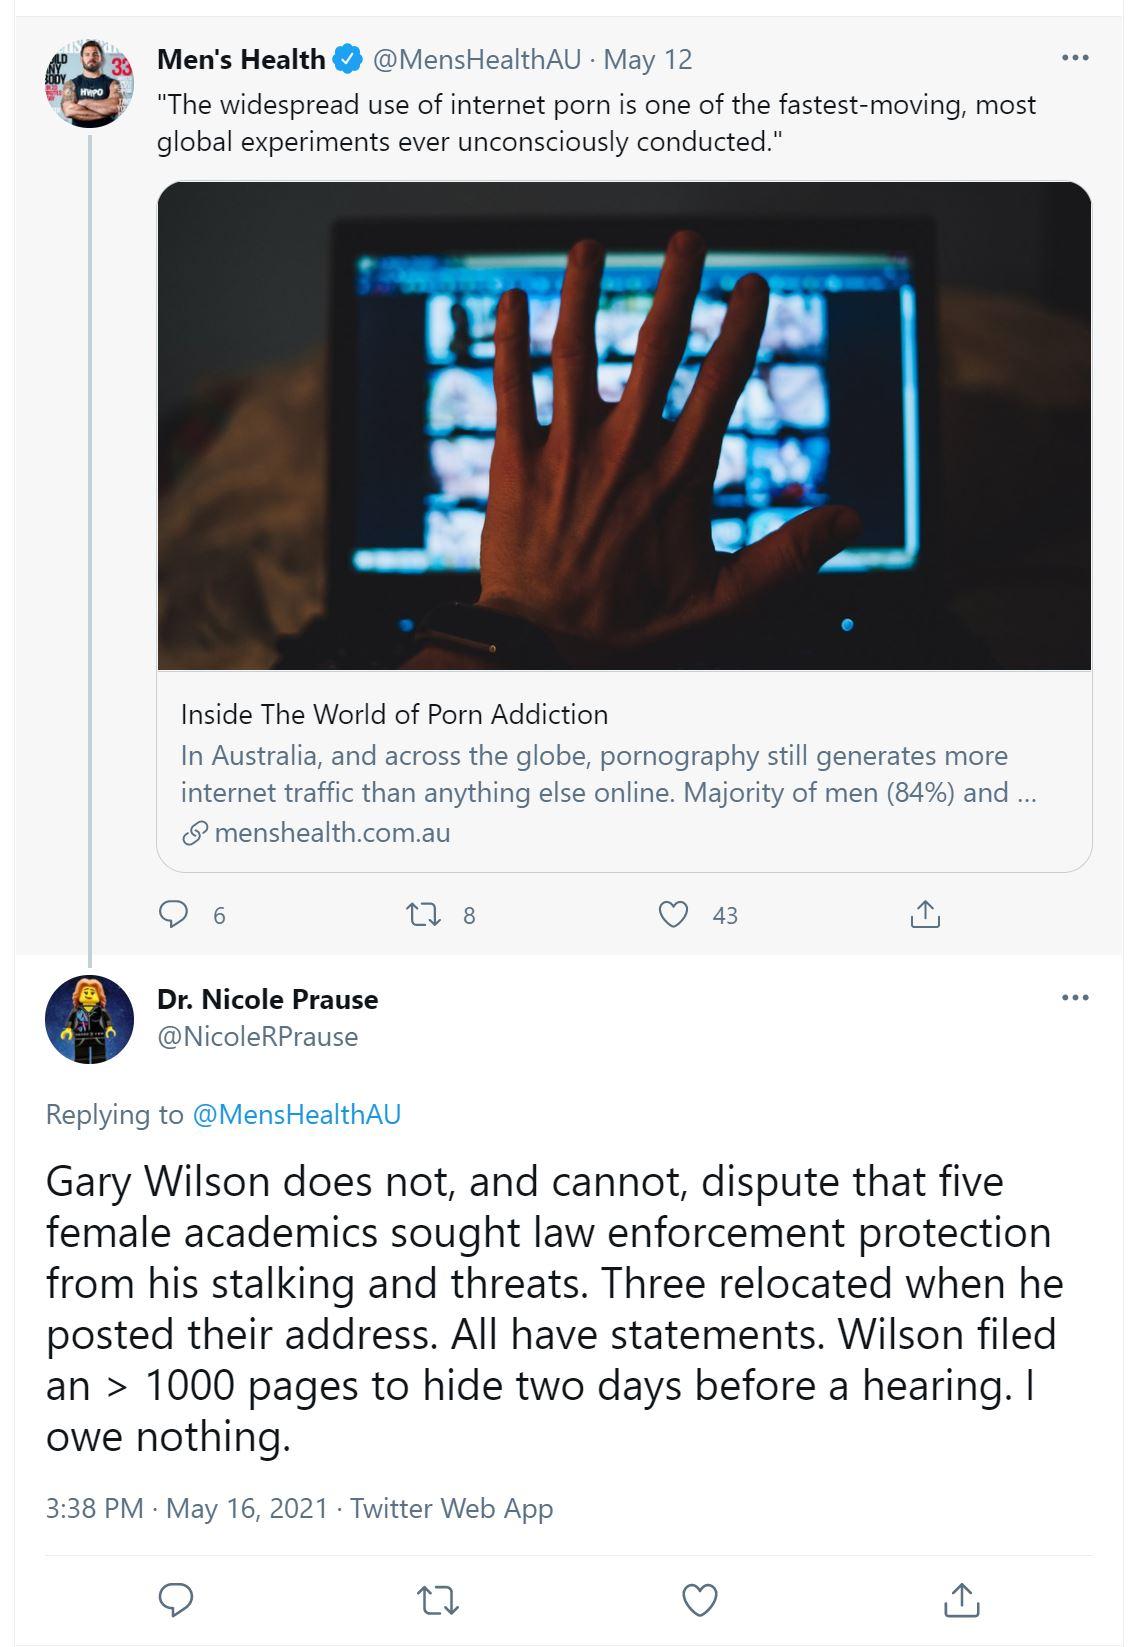 Nicole Prause lying about gary wilson